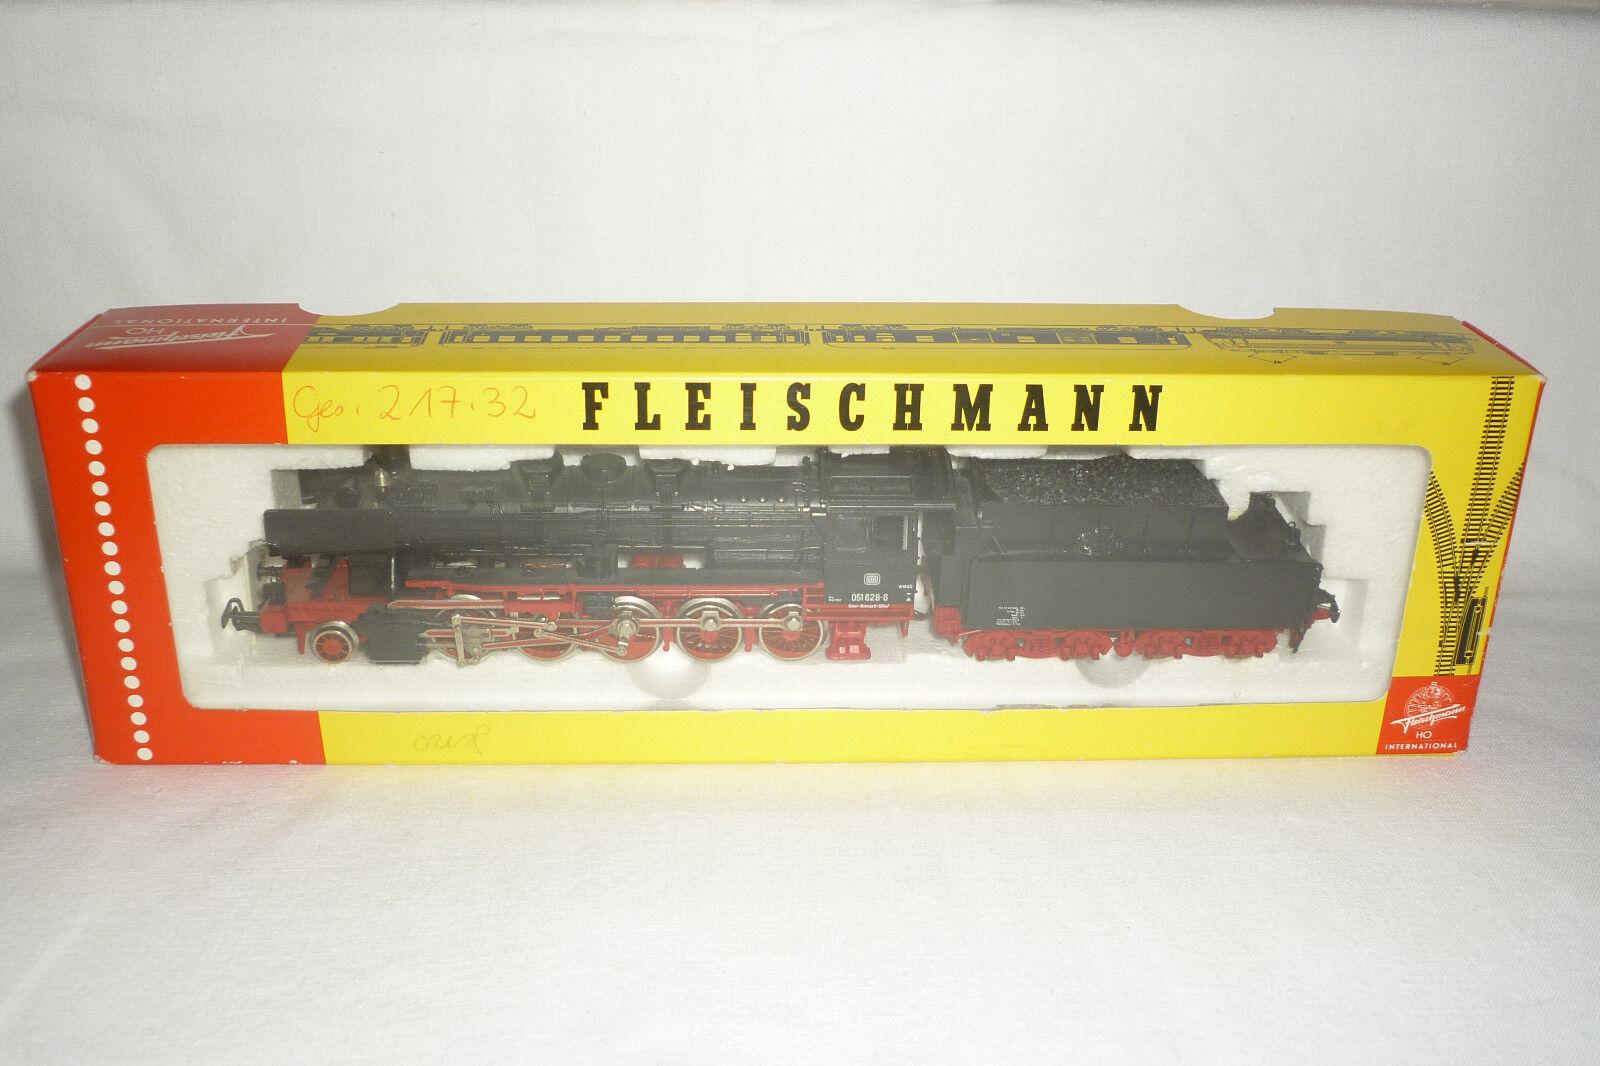 Fleischmann-spur h0-dampftenderlok DB 051 628-6 - artículo 4177-embalaje original (6.ei-18)